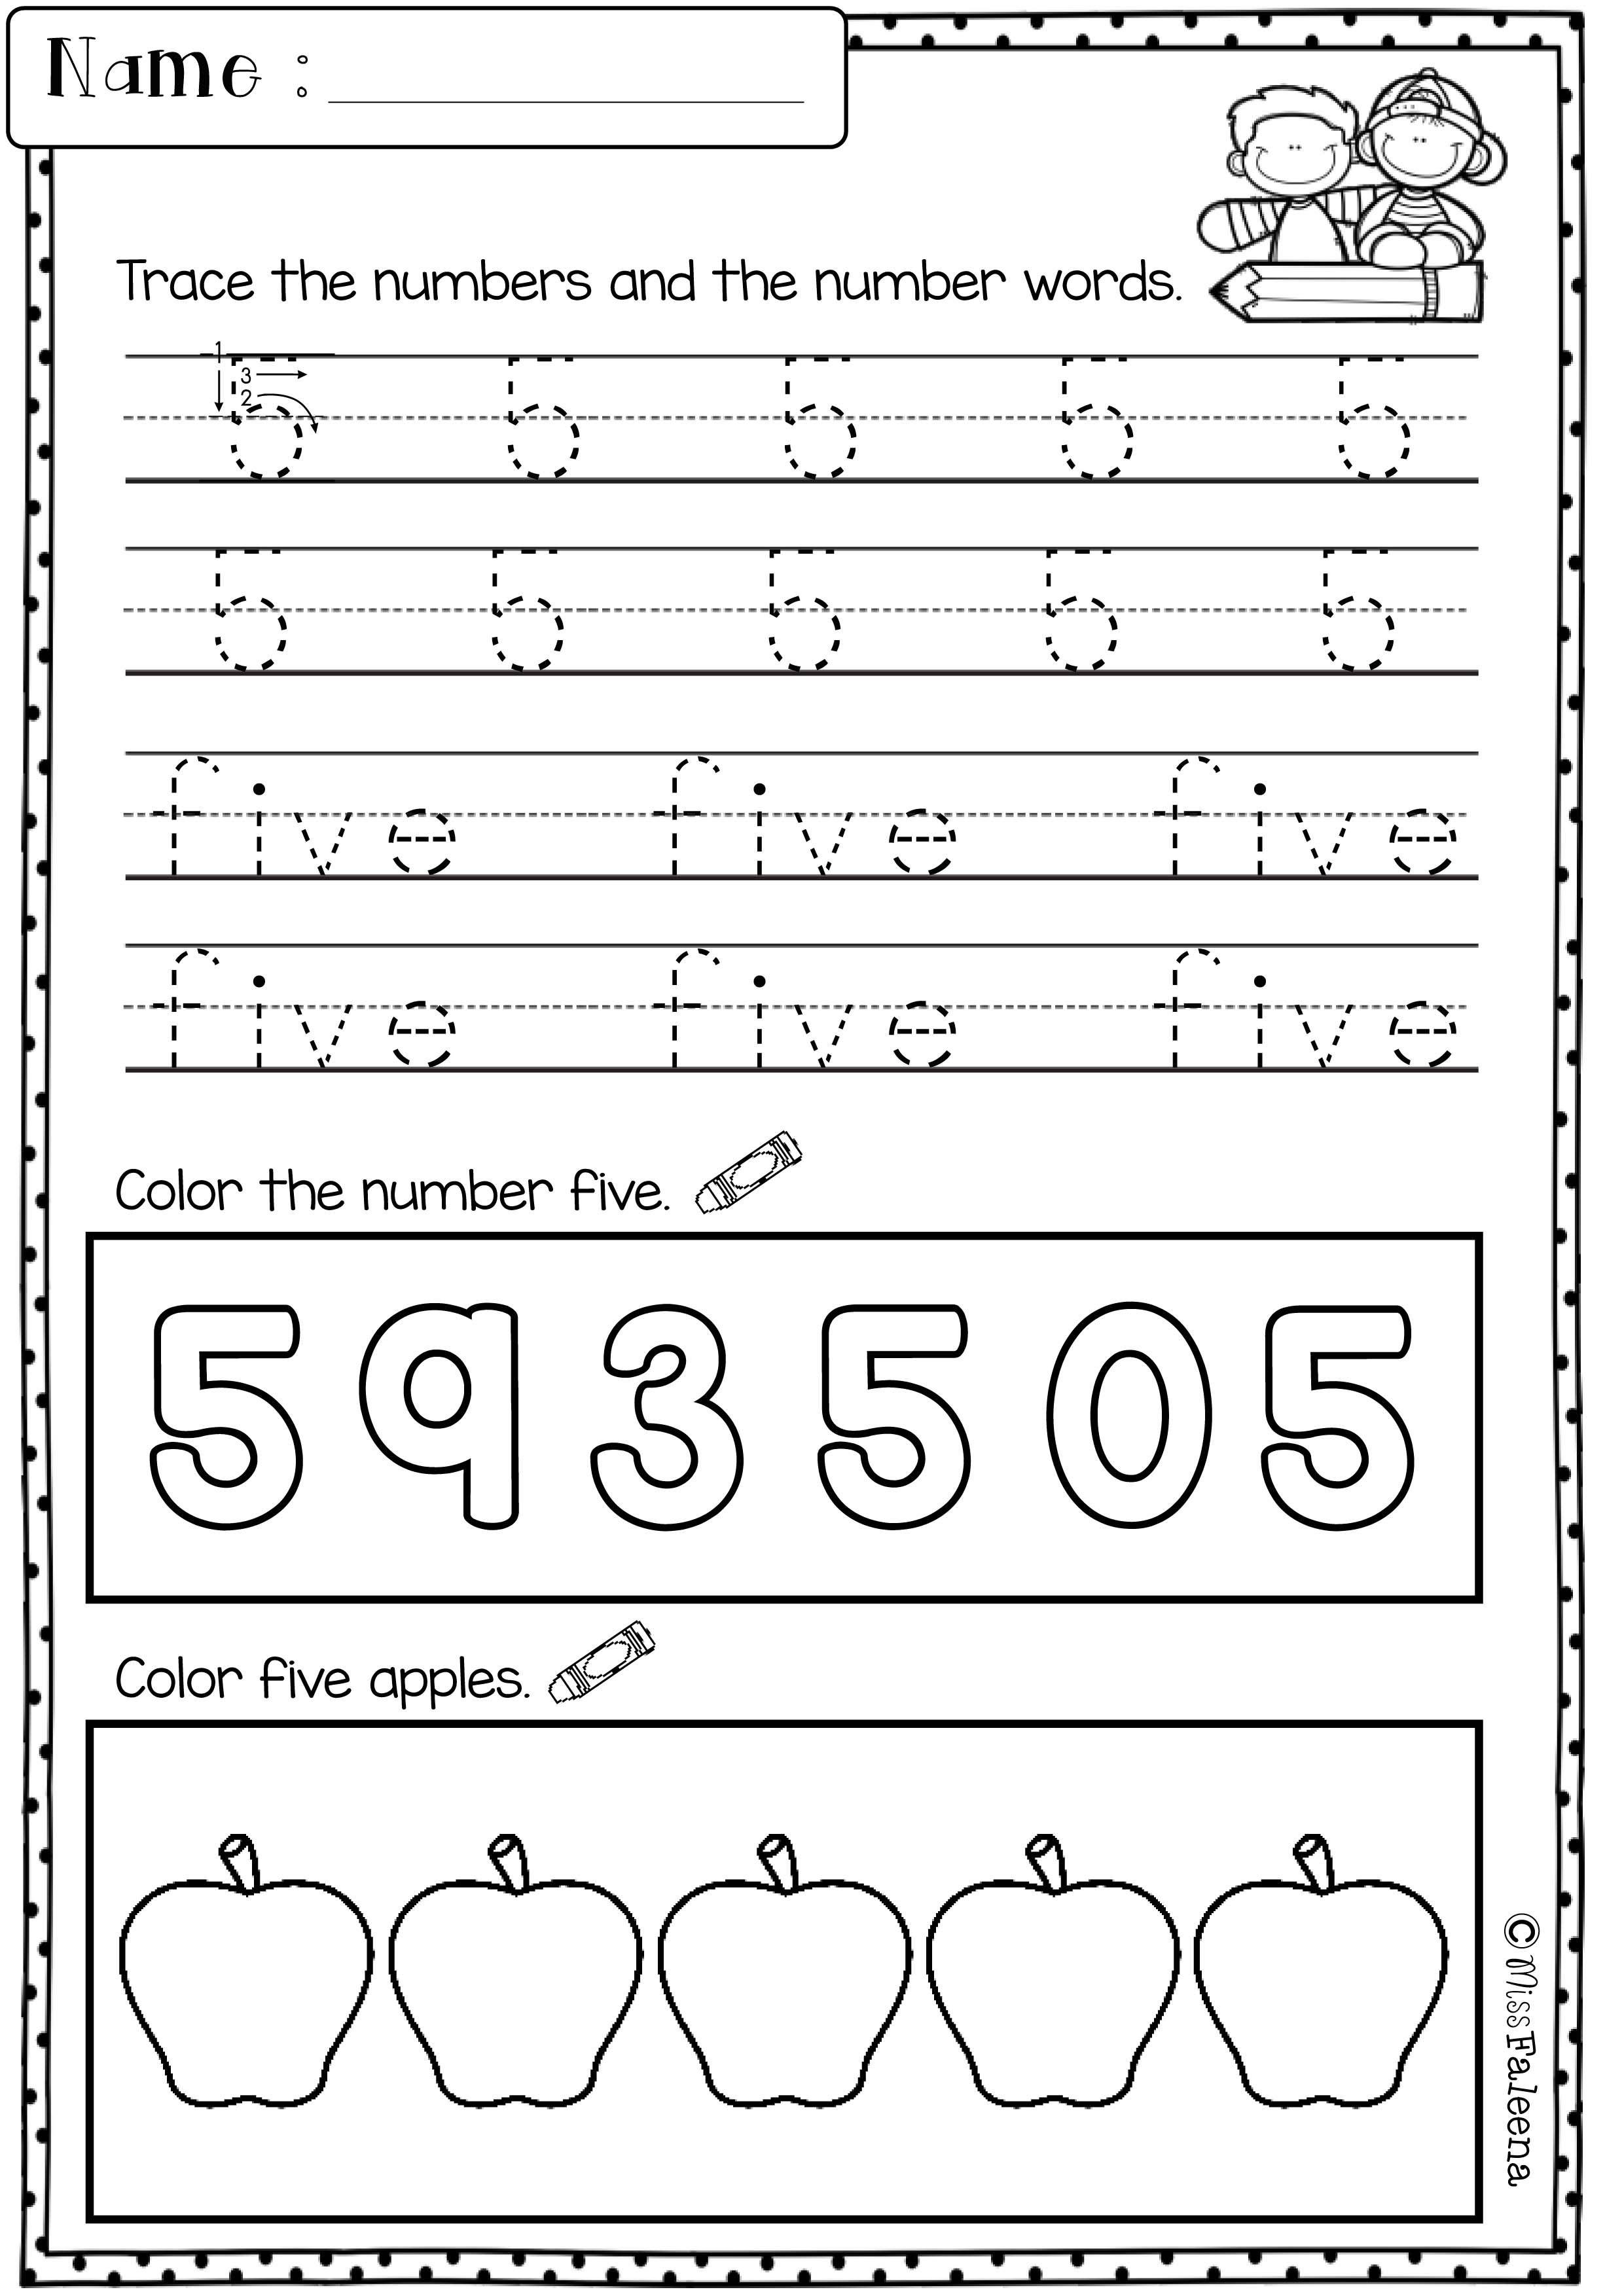 Free Kindergarten Morning Work Includes 18 Worksheet Pages These Pages Are Gr Kindergarten Morning Work Morning Work Kindergarten Free Kindergarten Worksheets Writing workbook for kindergarten